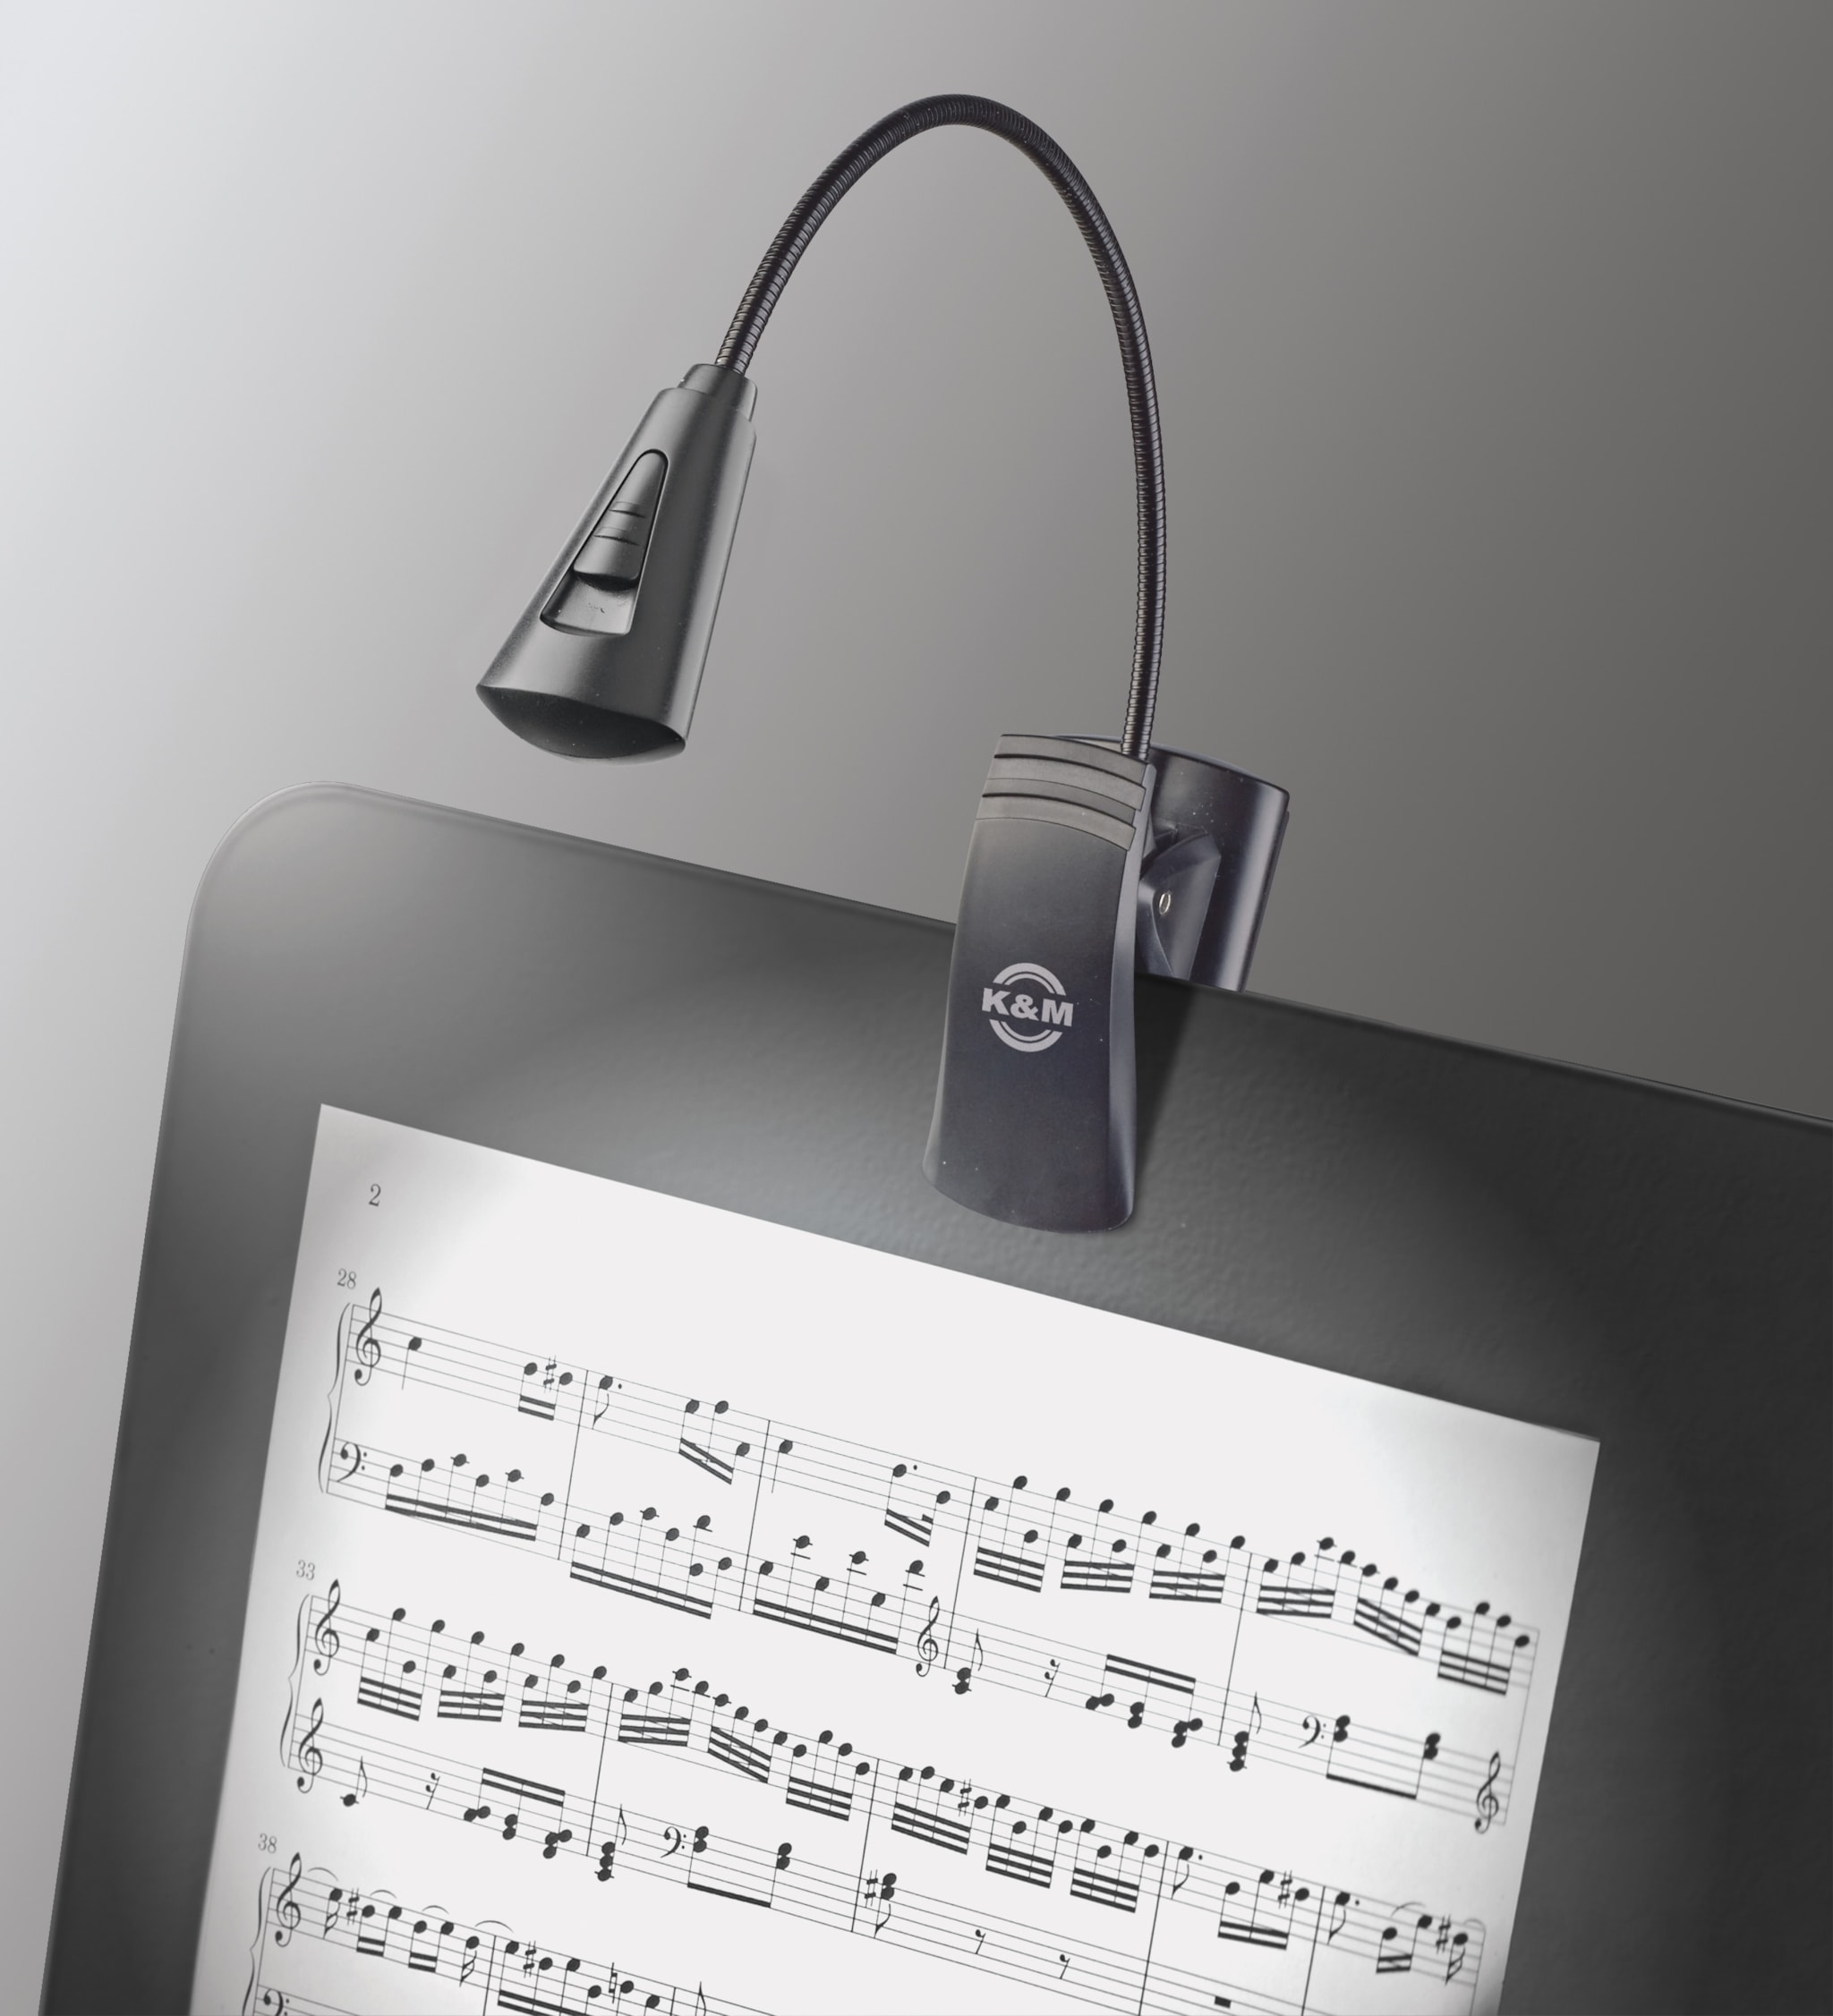 KM12242 - Music stand light »2 LED FlexLight«